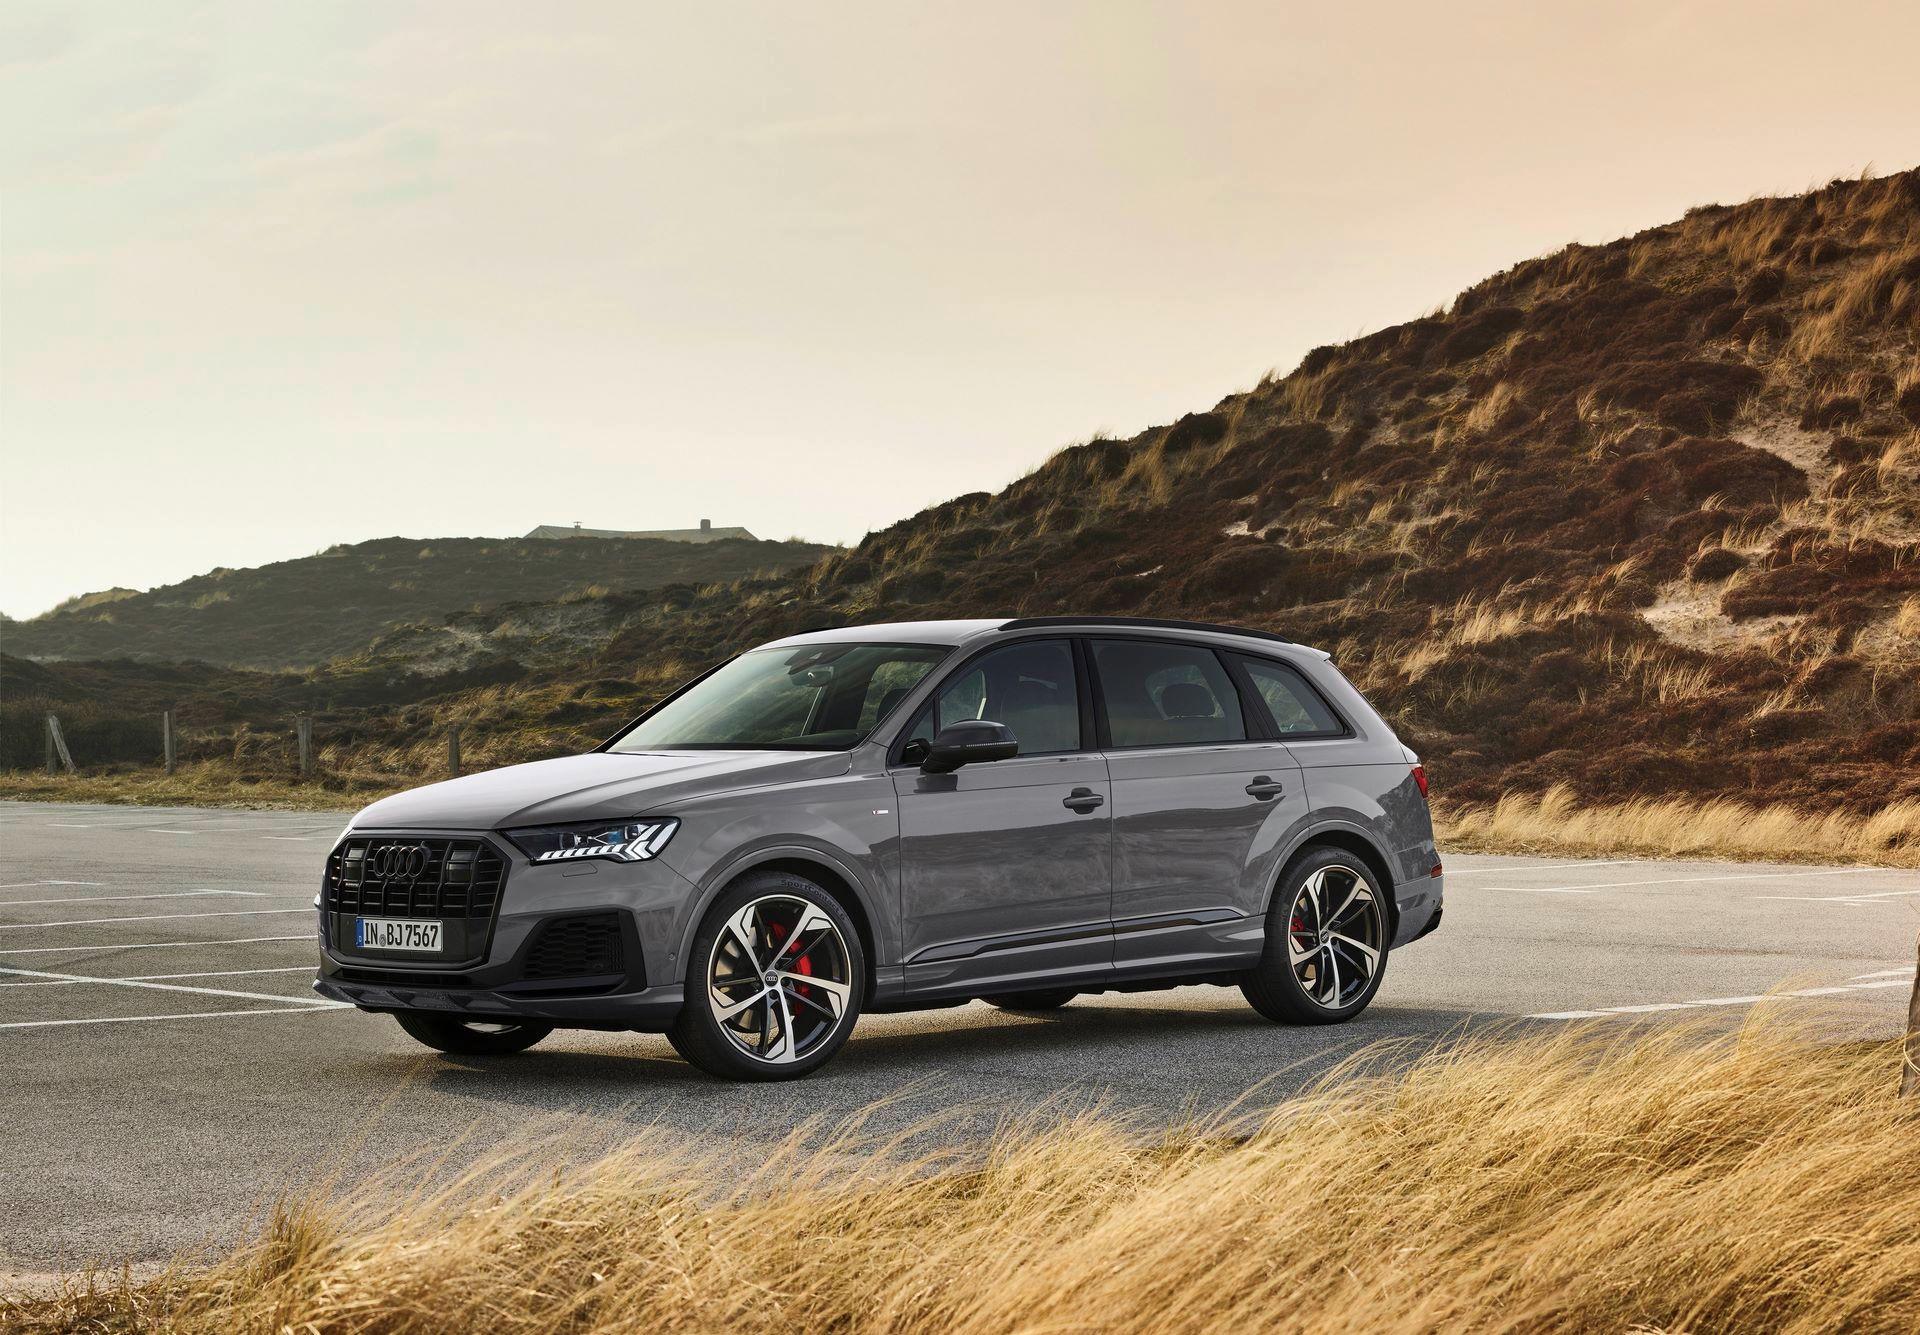 Audi-A4-A5-Q7-Q8-Competition-And-Competition-Plus-Trims-40